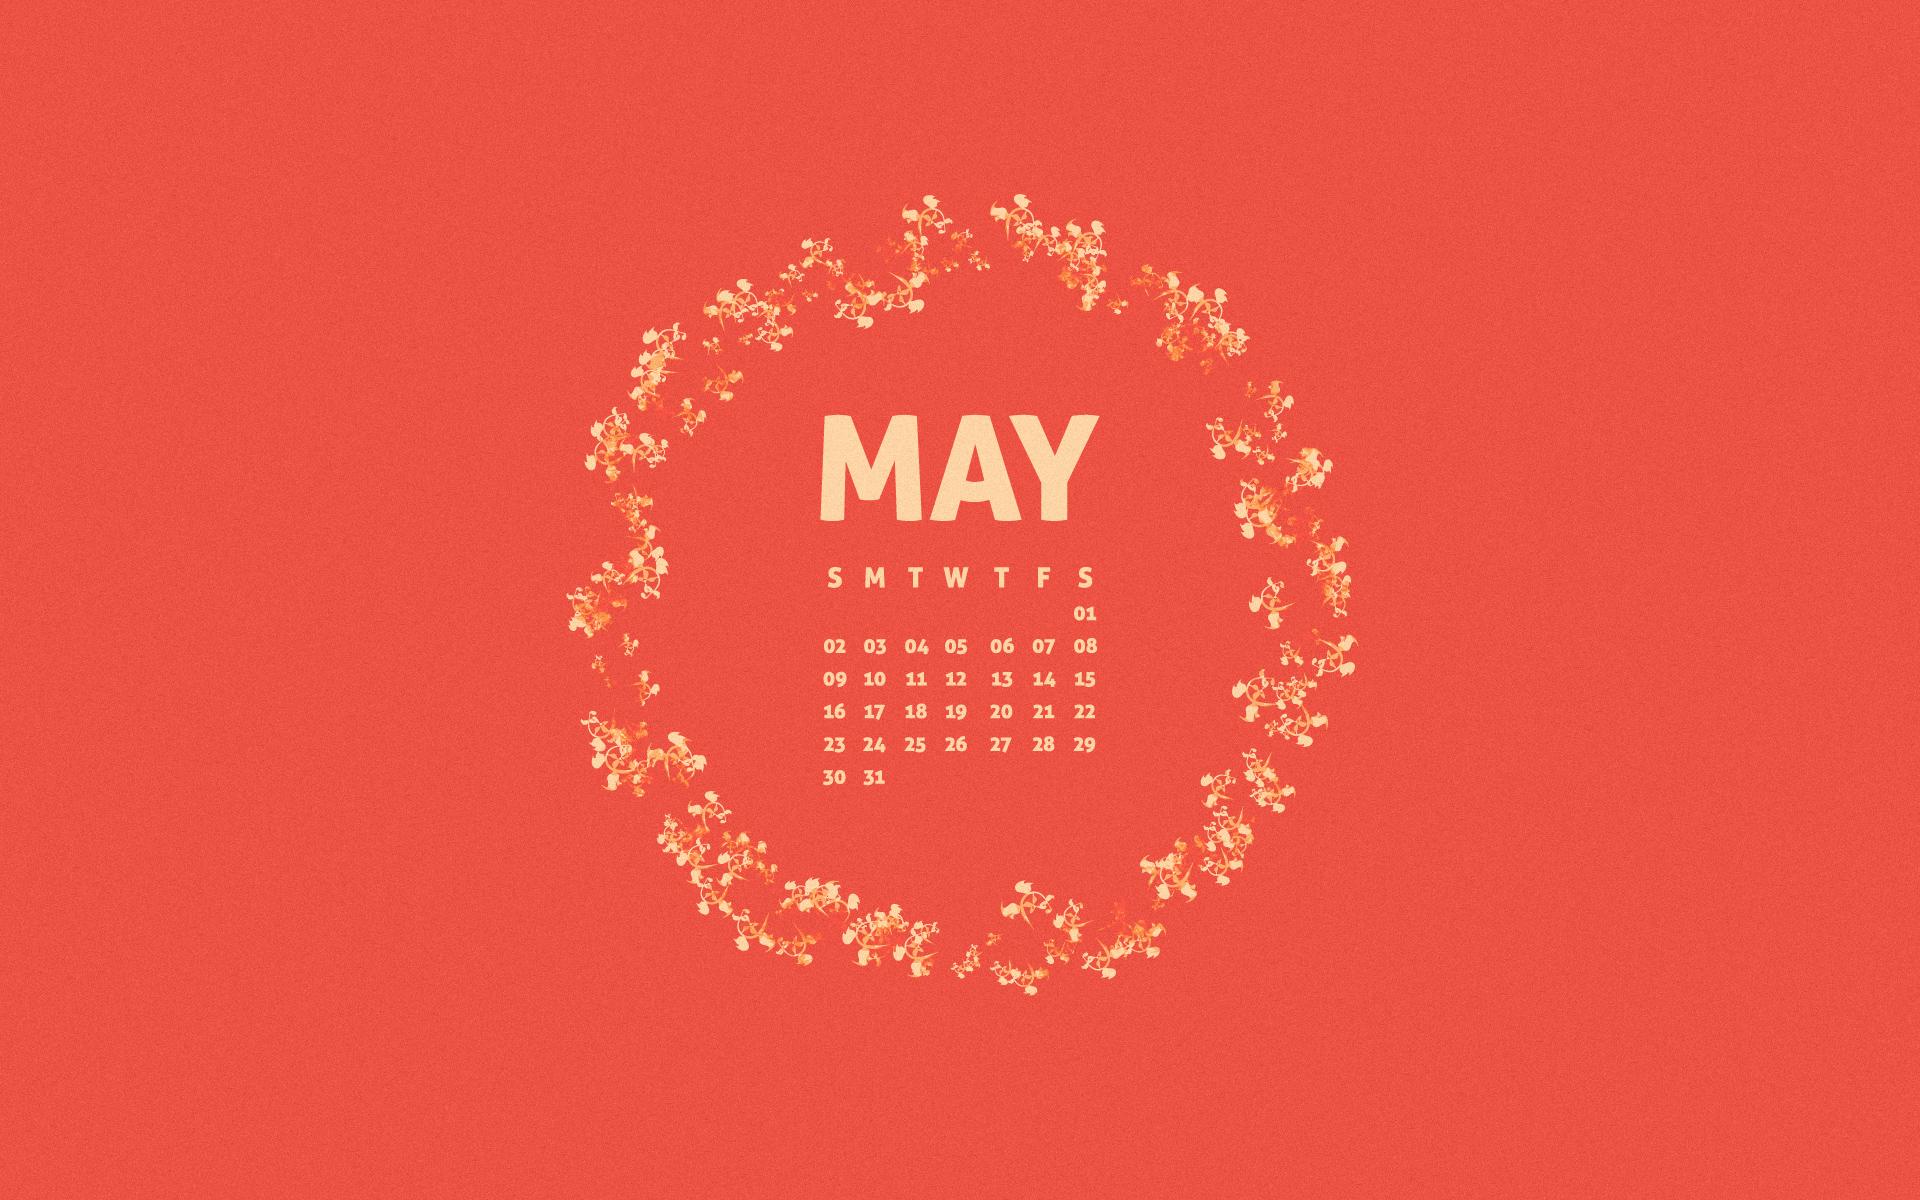 Click to download the May 2010 Desktop Calendar Wallpaper in 1920X1200 1920x1200